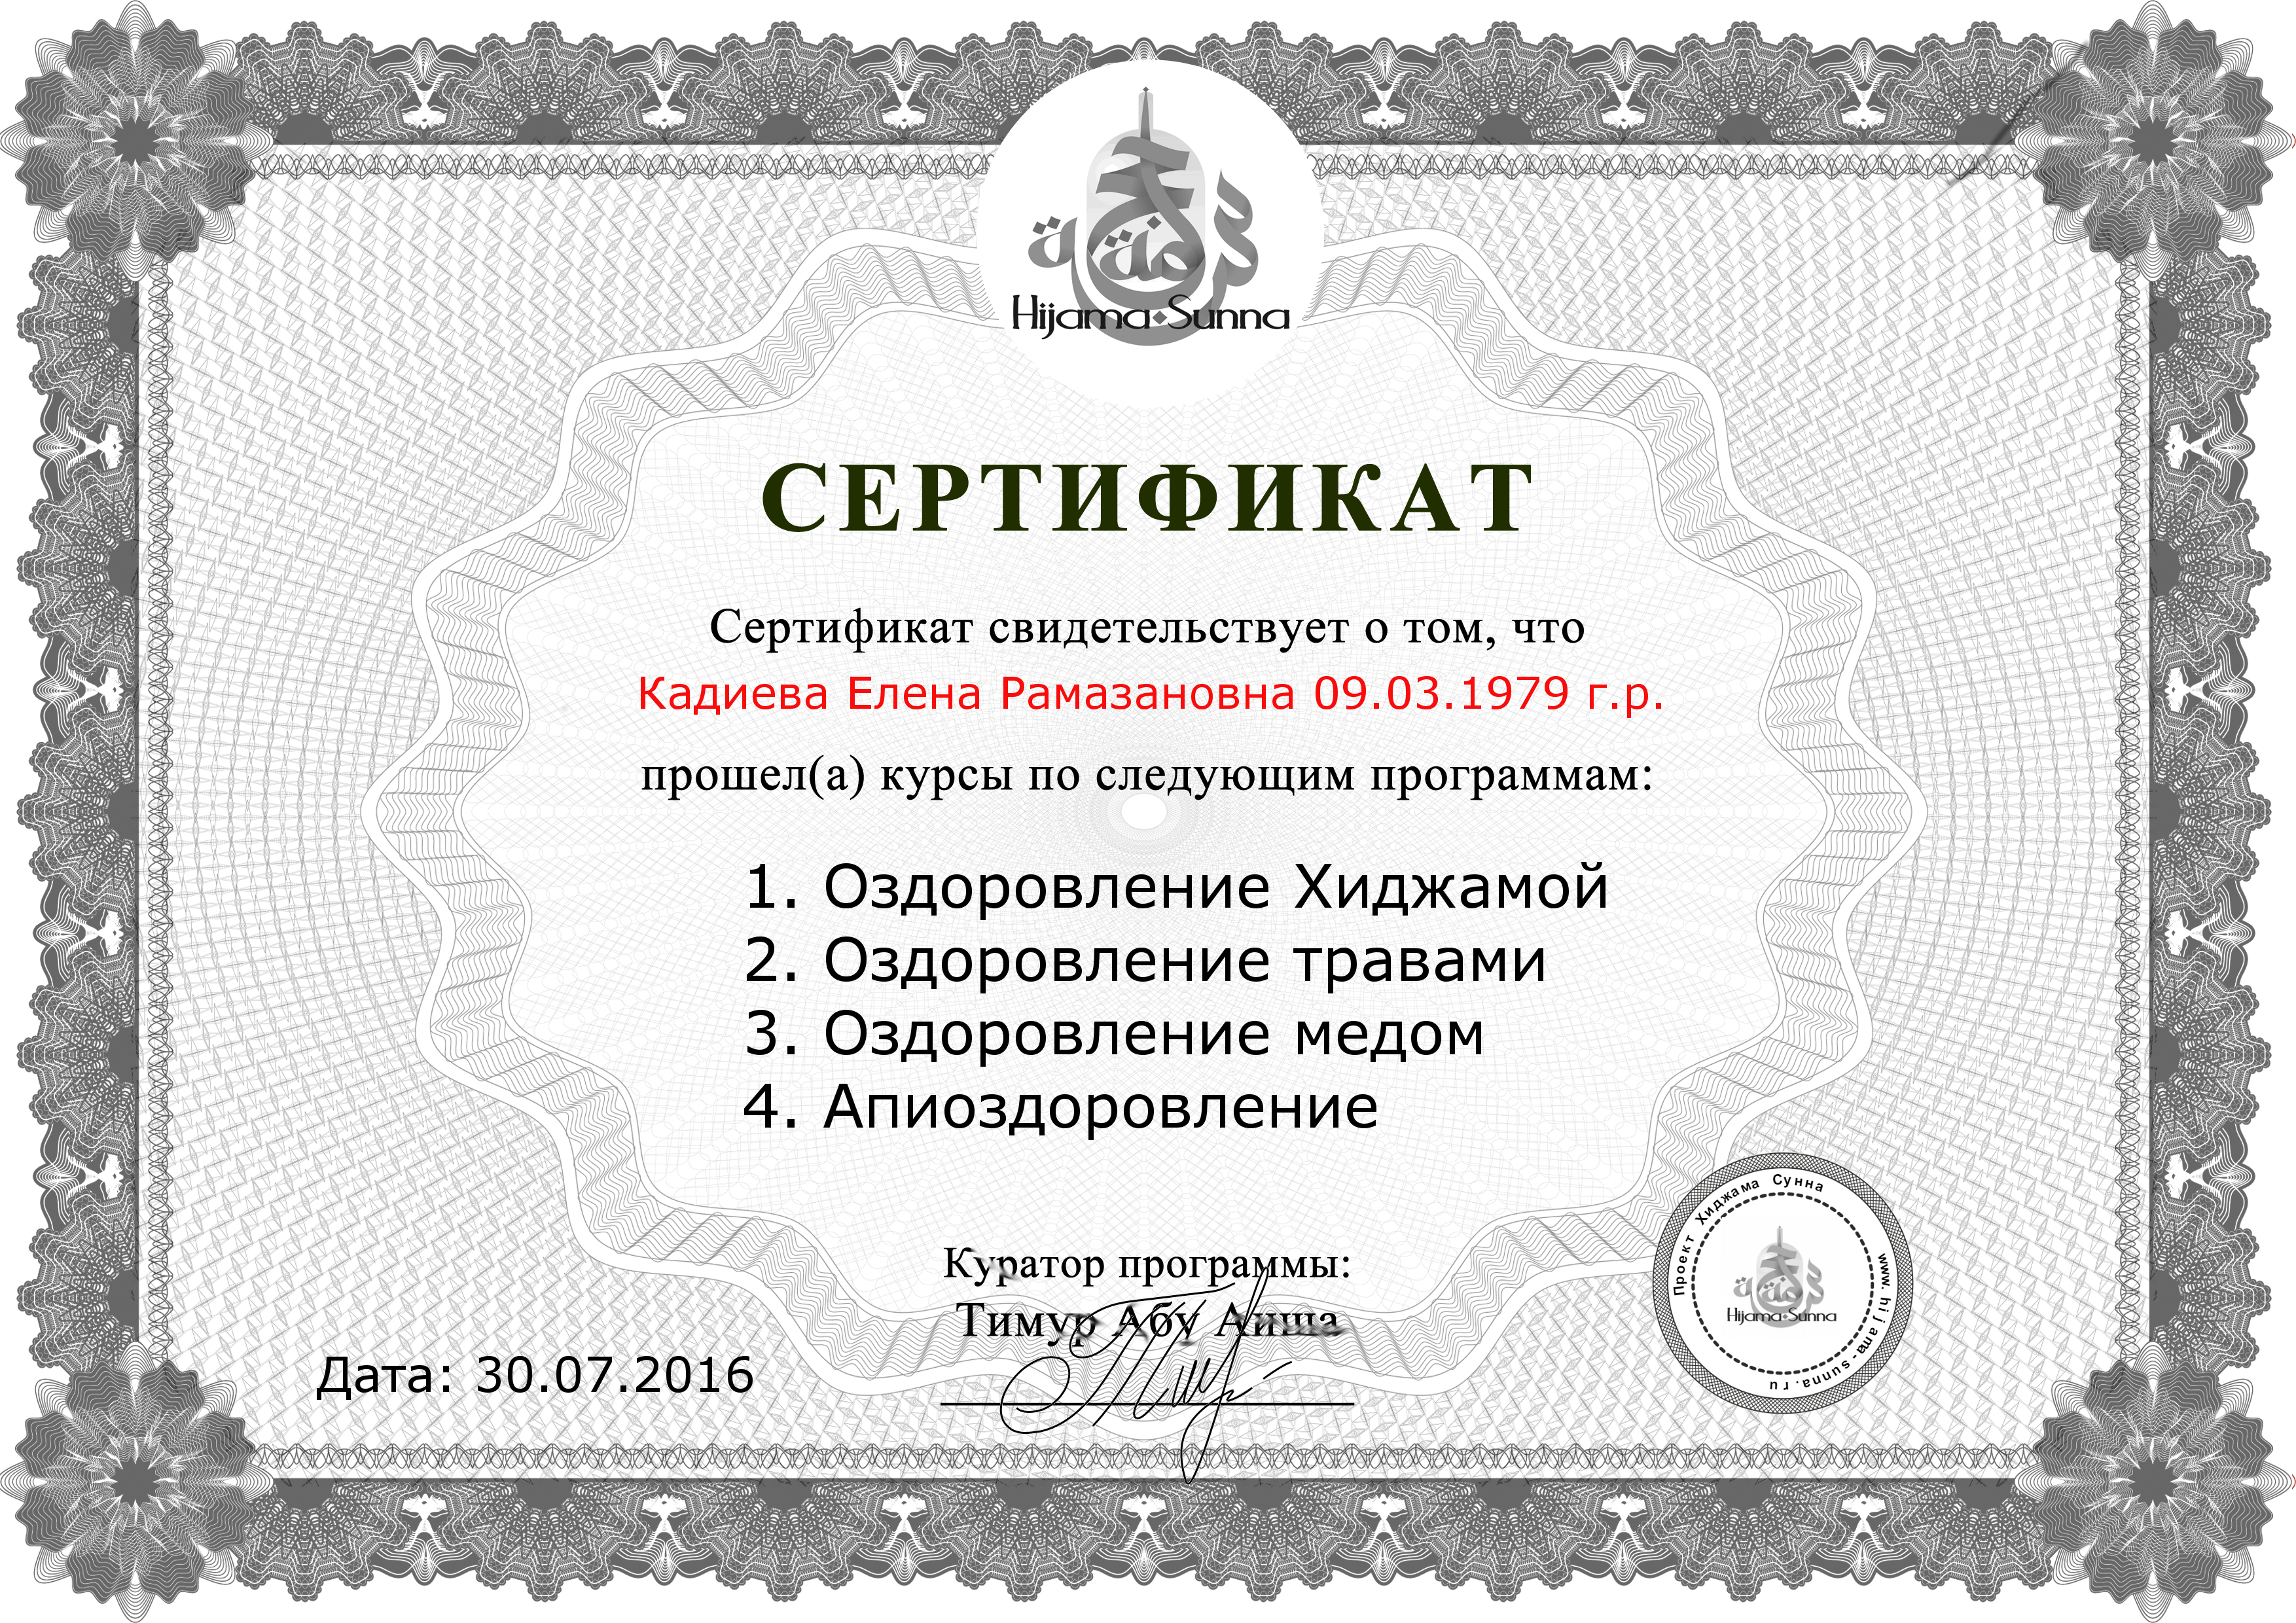 хиджама сертификат изербаш